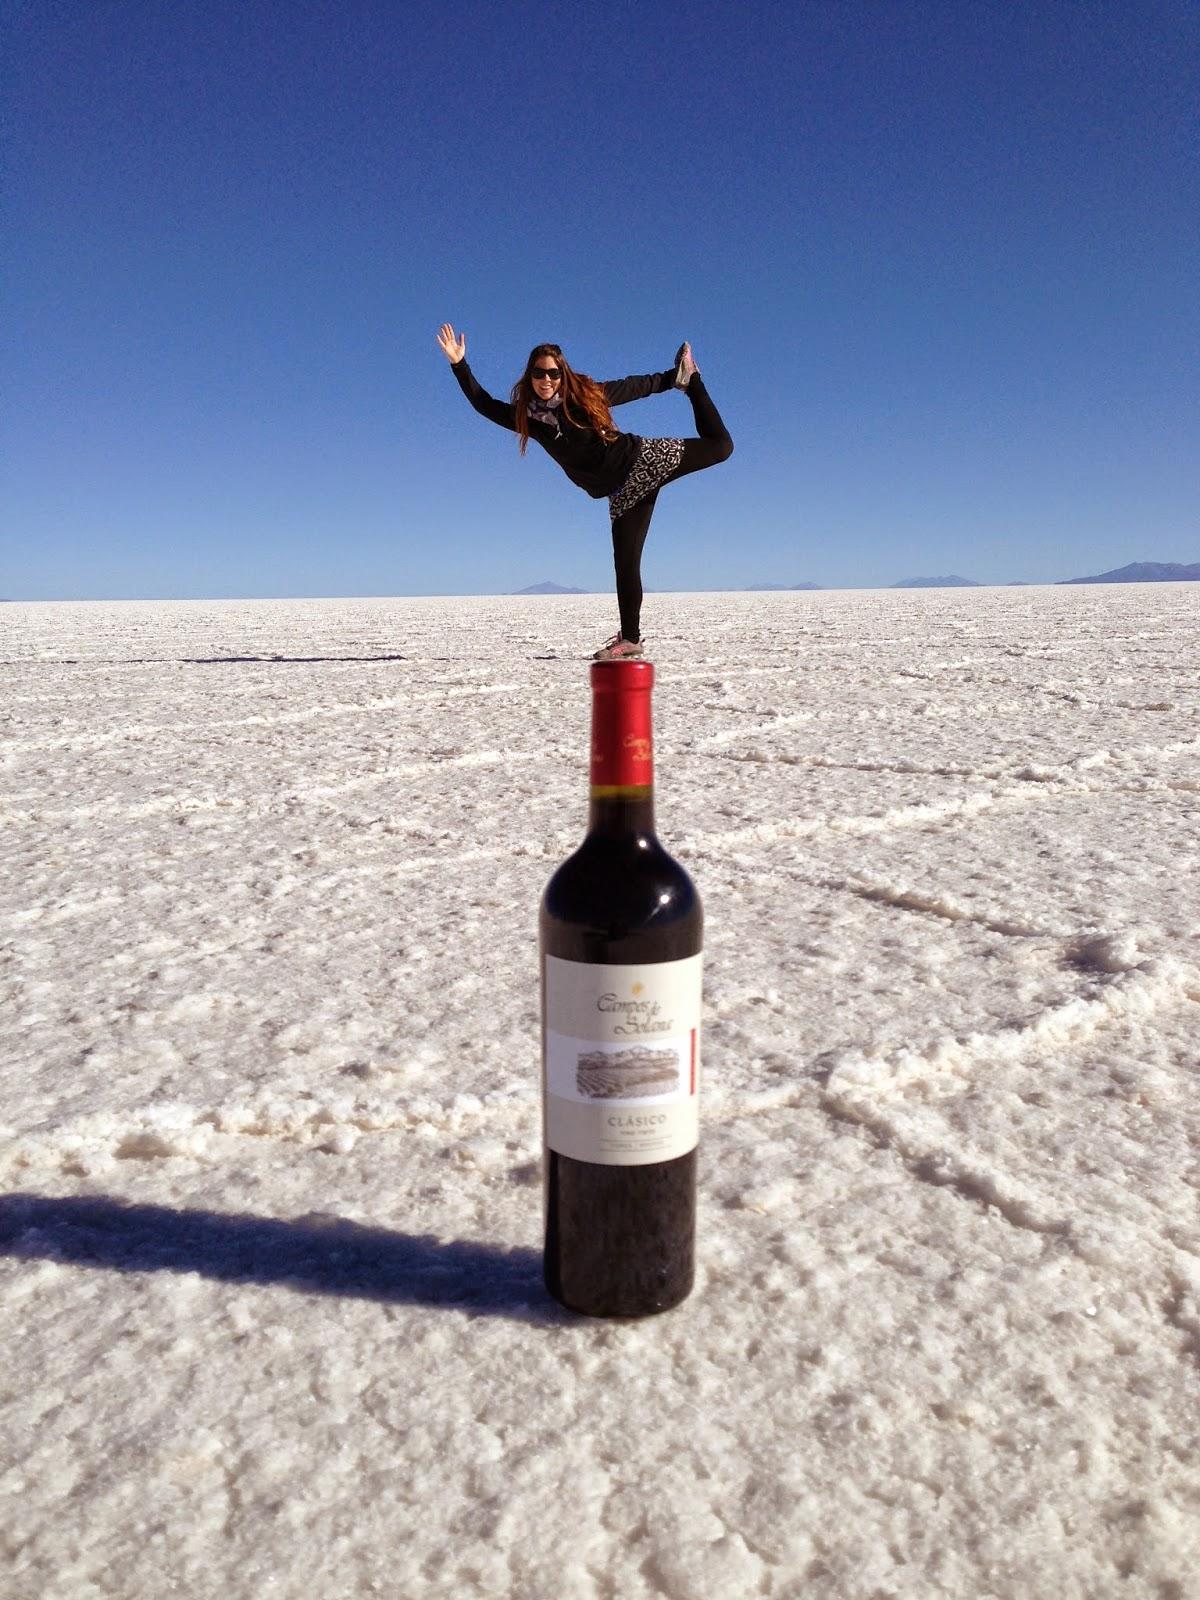 Salar De Uyuni Bolivia Red Planet Wine dancer